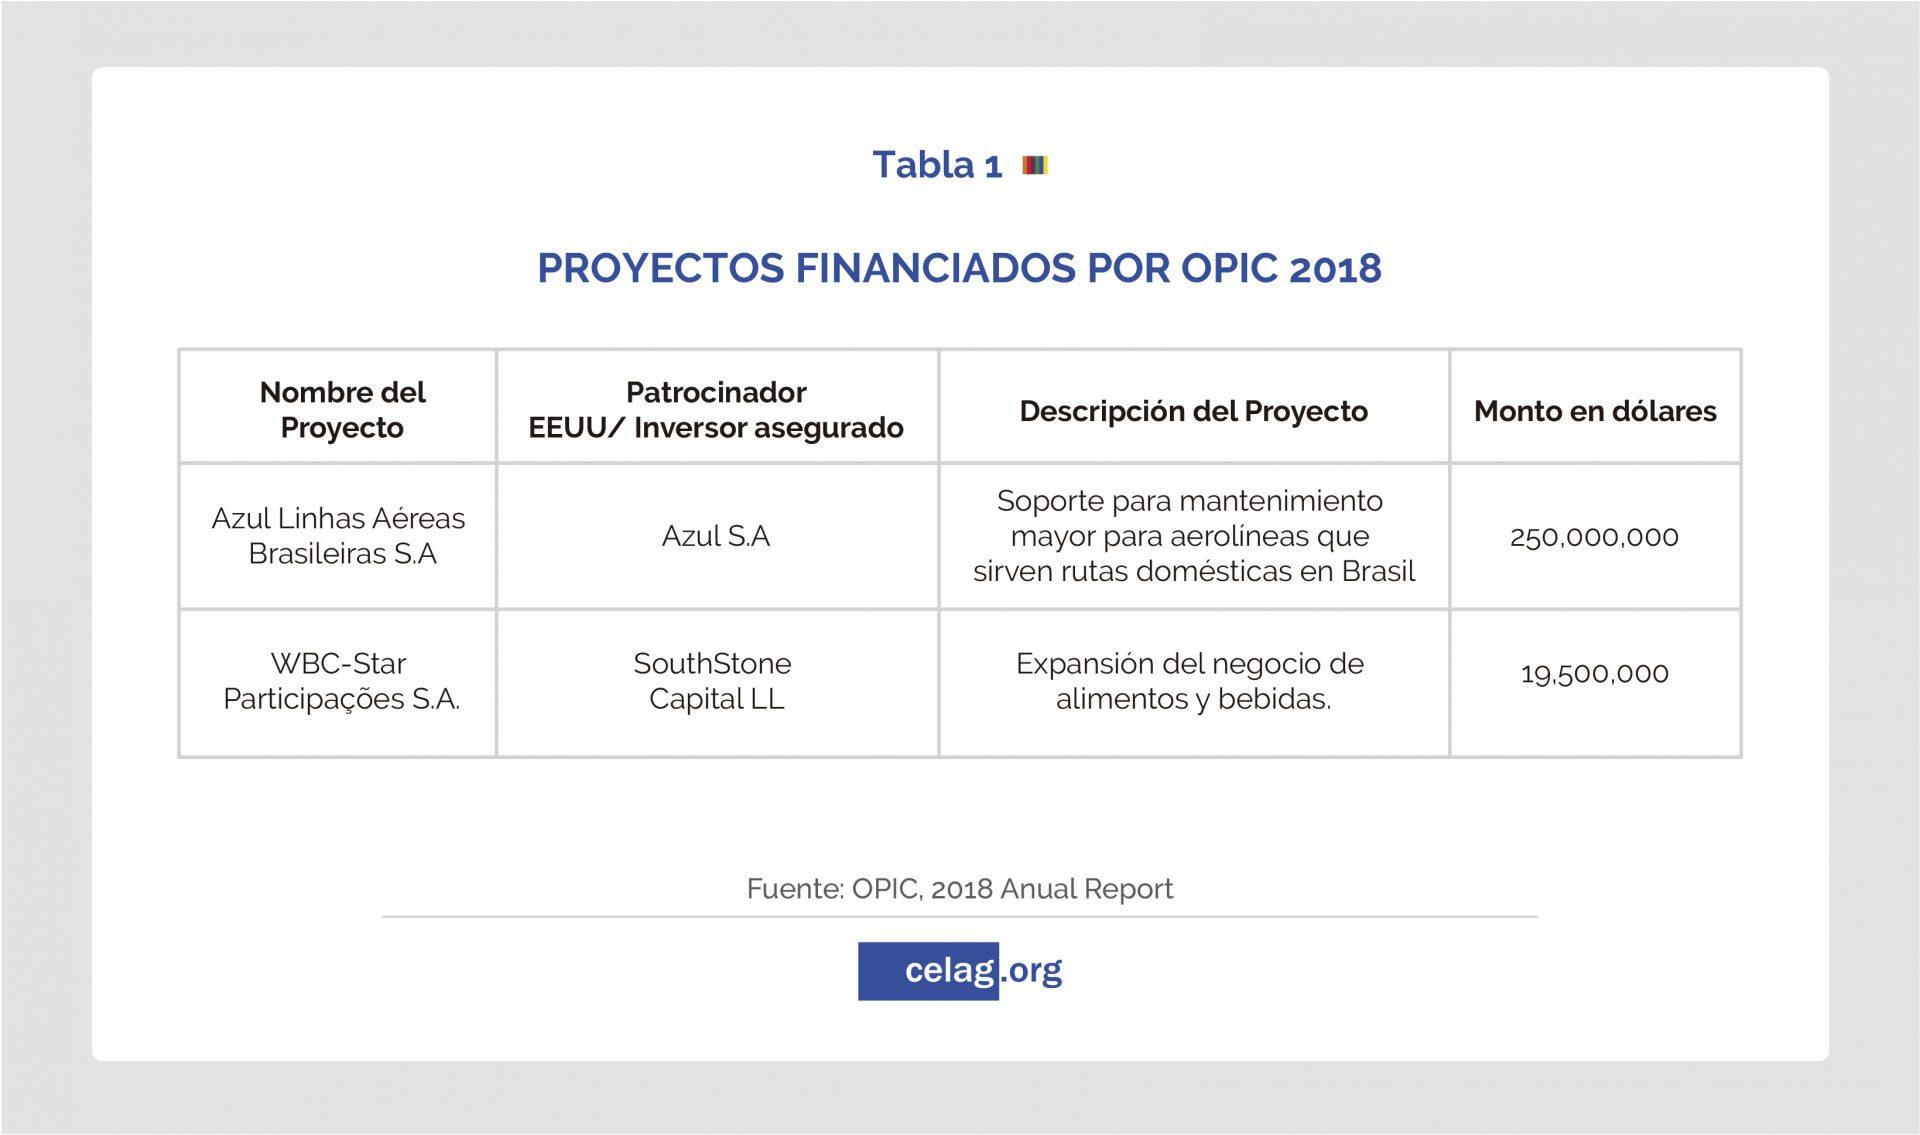 Proyectos financiados por OPIC 2018